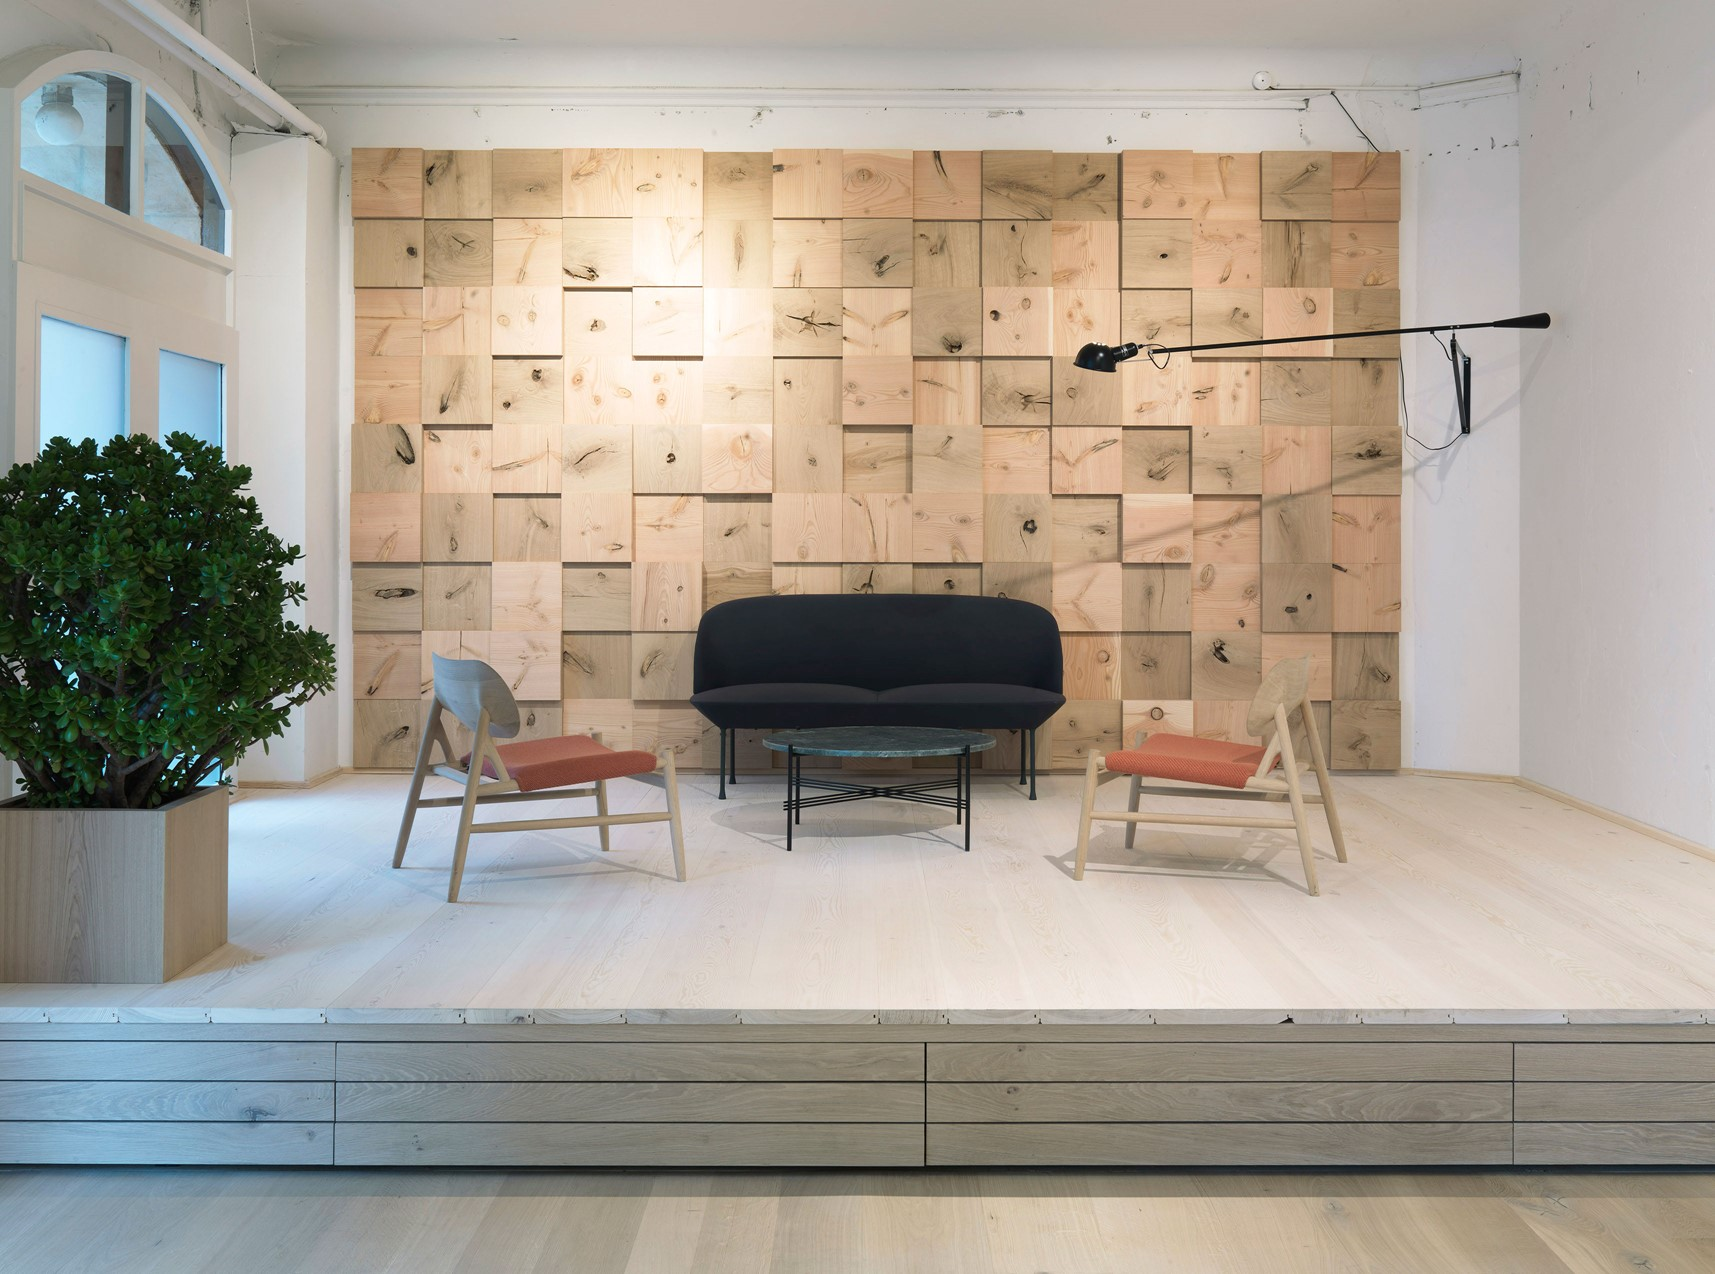 douglas-floor_lye-and-white-soap_dinesen-showroom-copenhagen_podie_dinesen.jpg